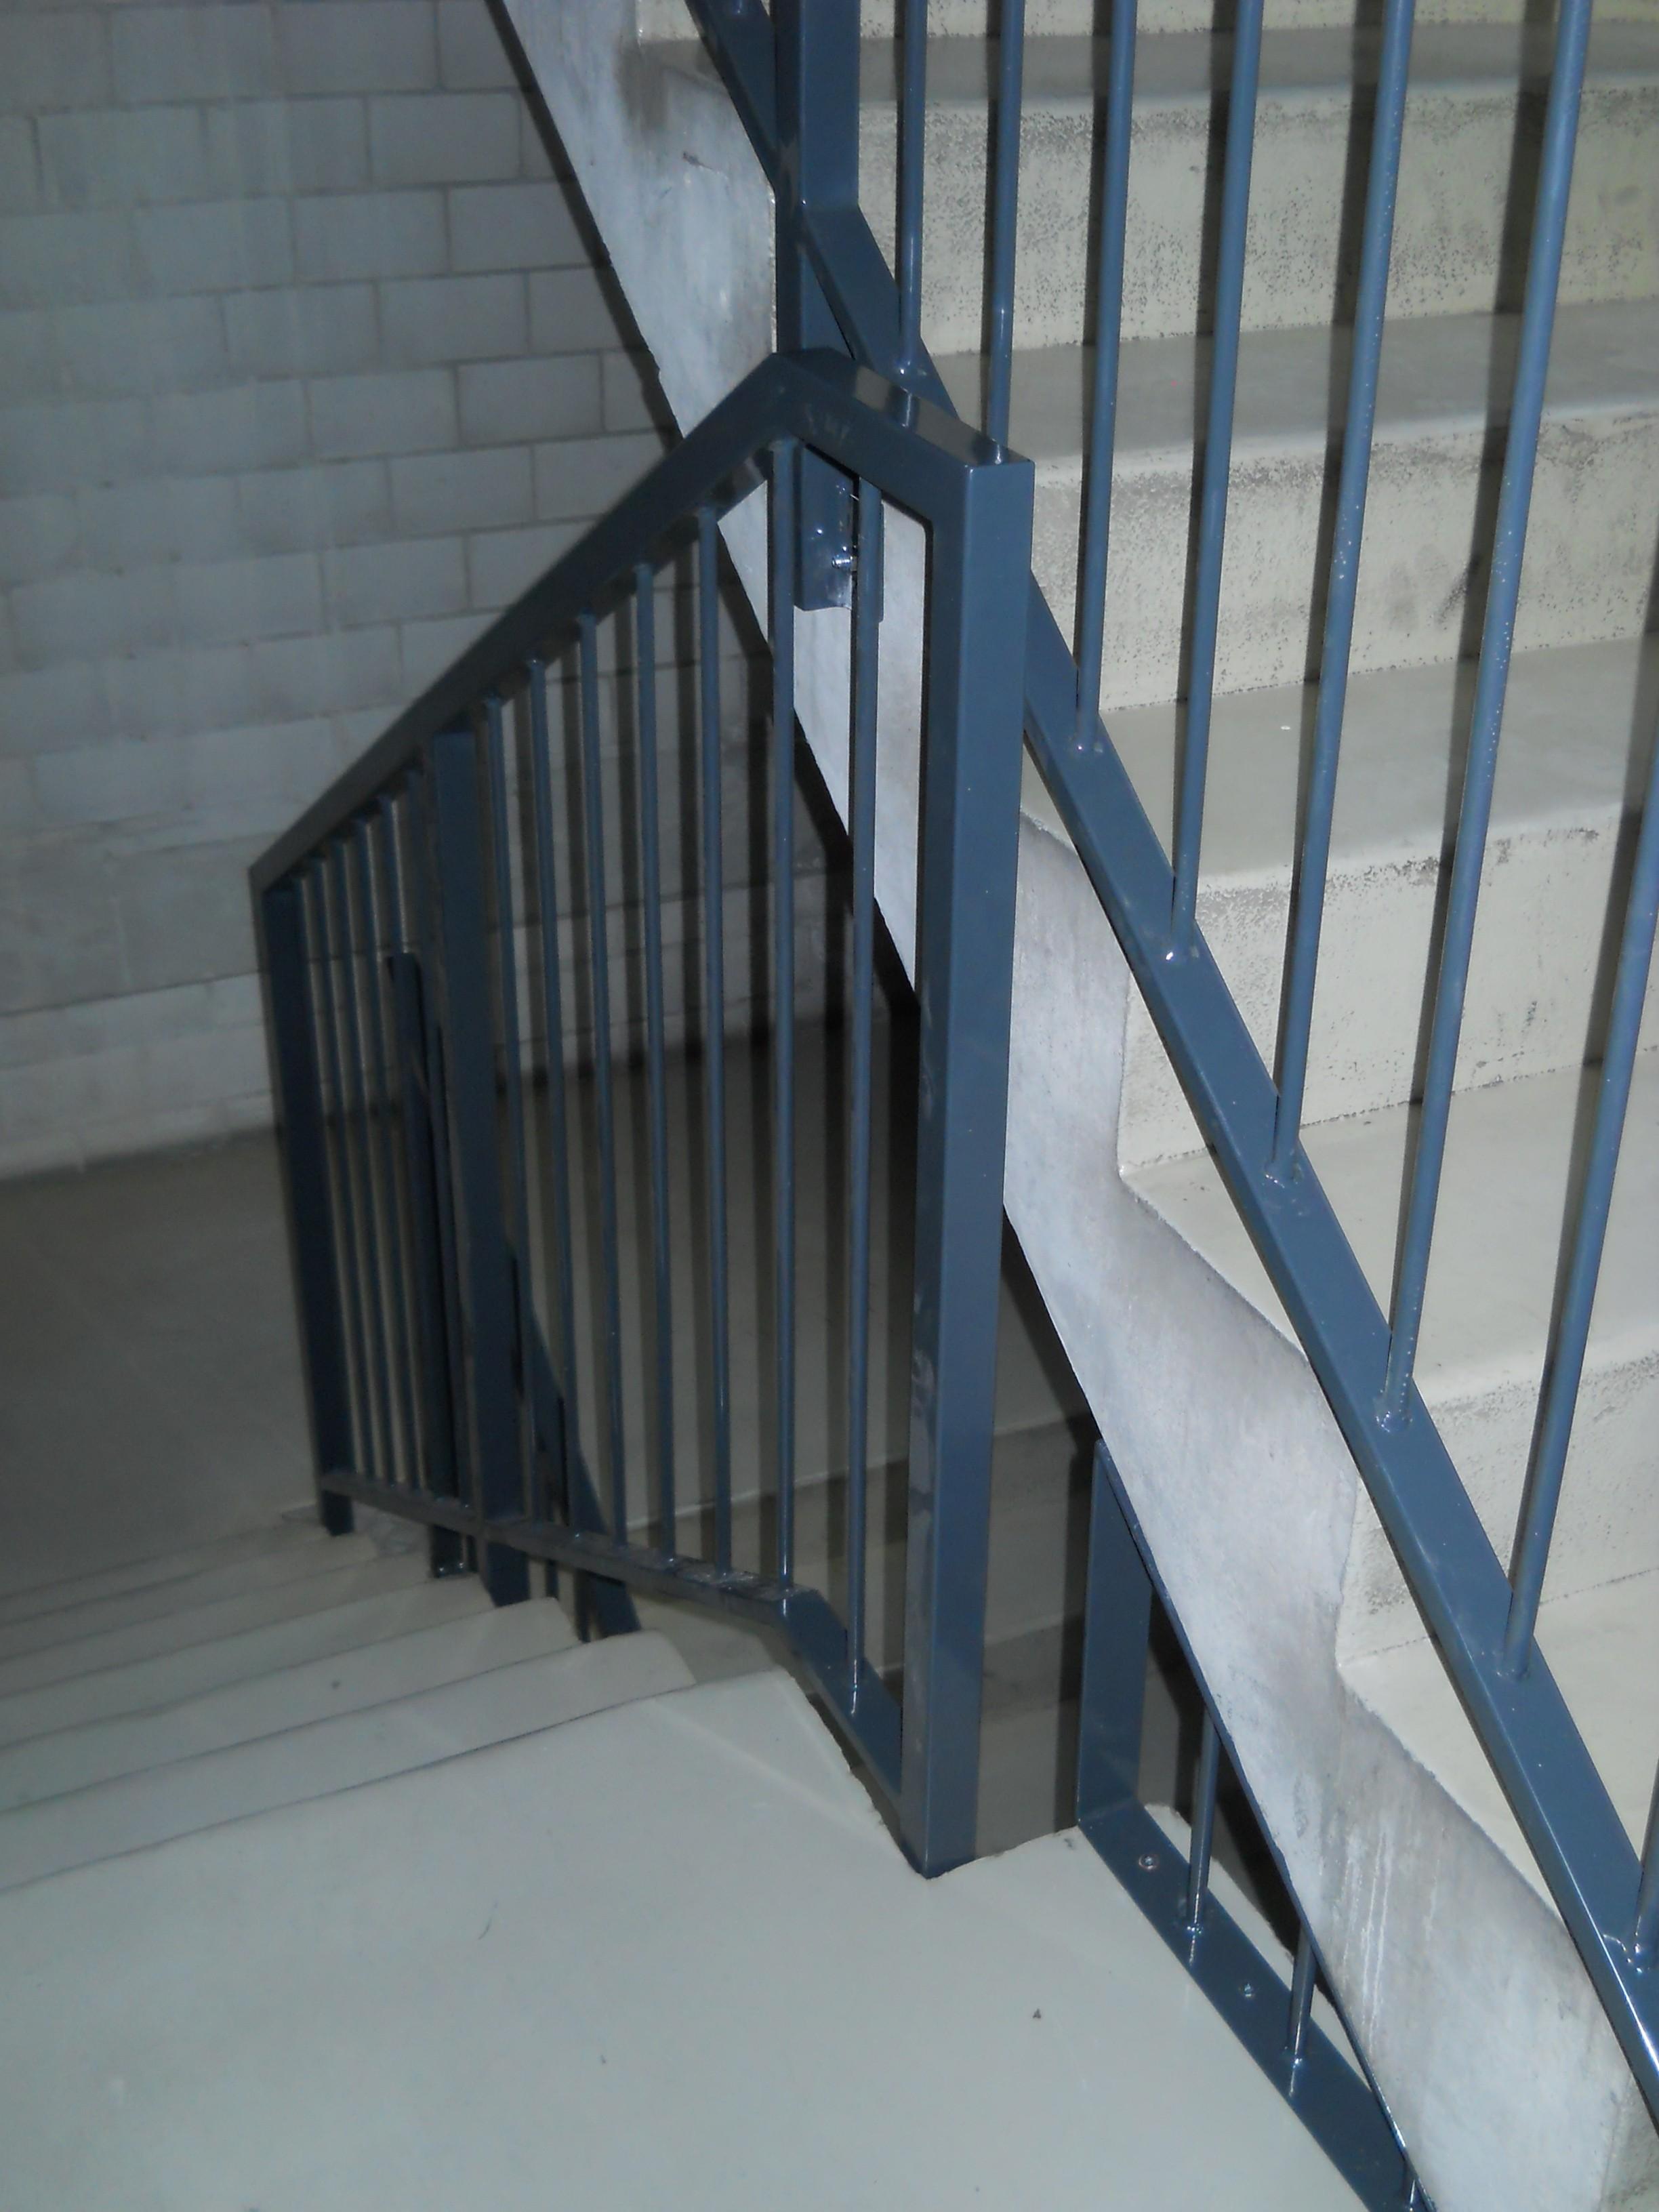 j cl perrenoud barri re d escalier. Black Bedroom Furniture Sets. Home Design Ideas